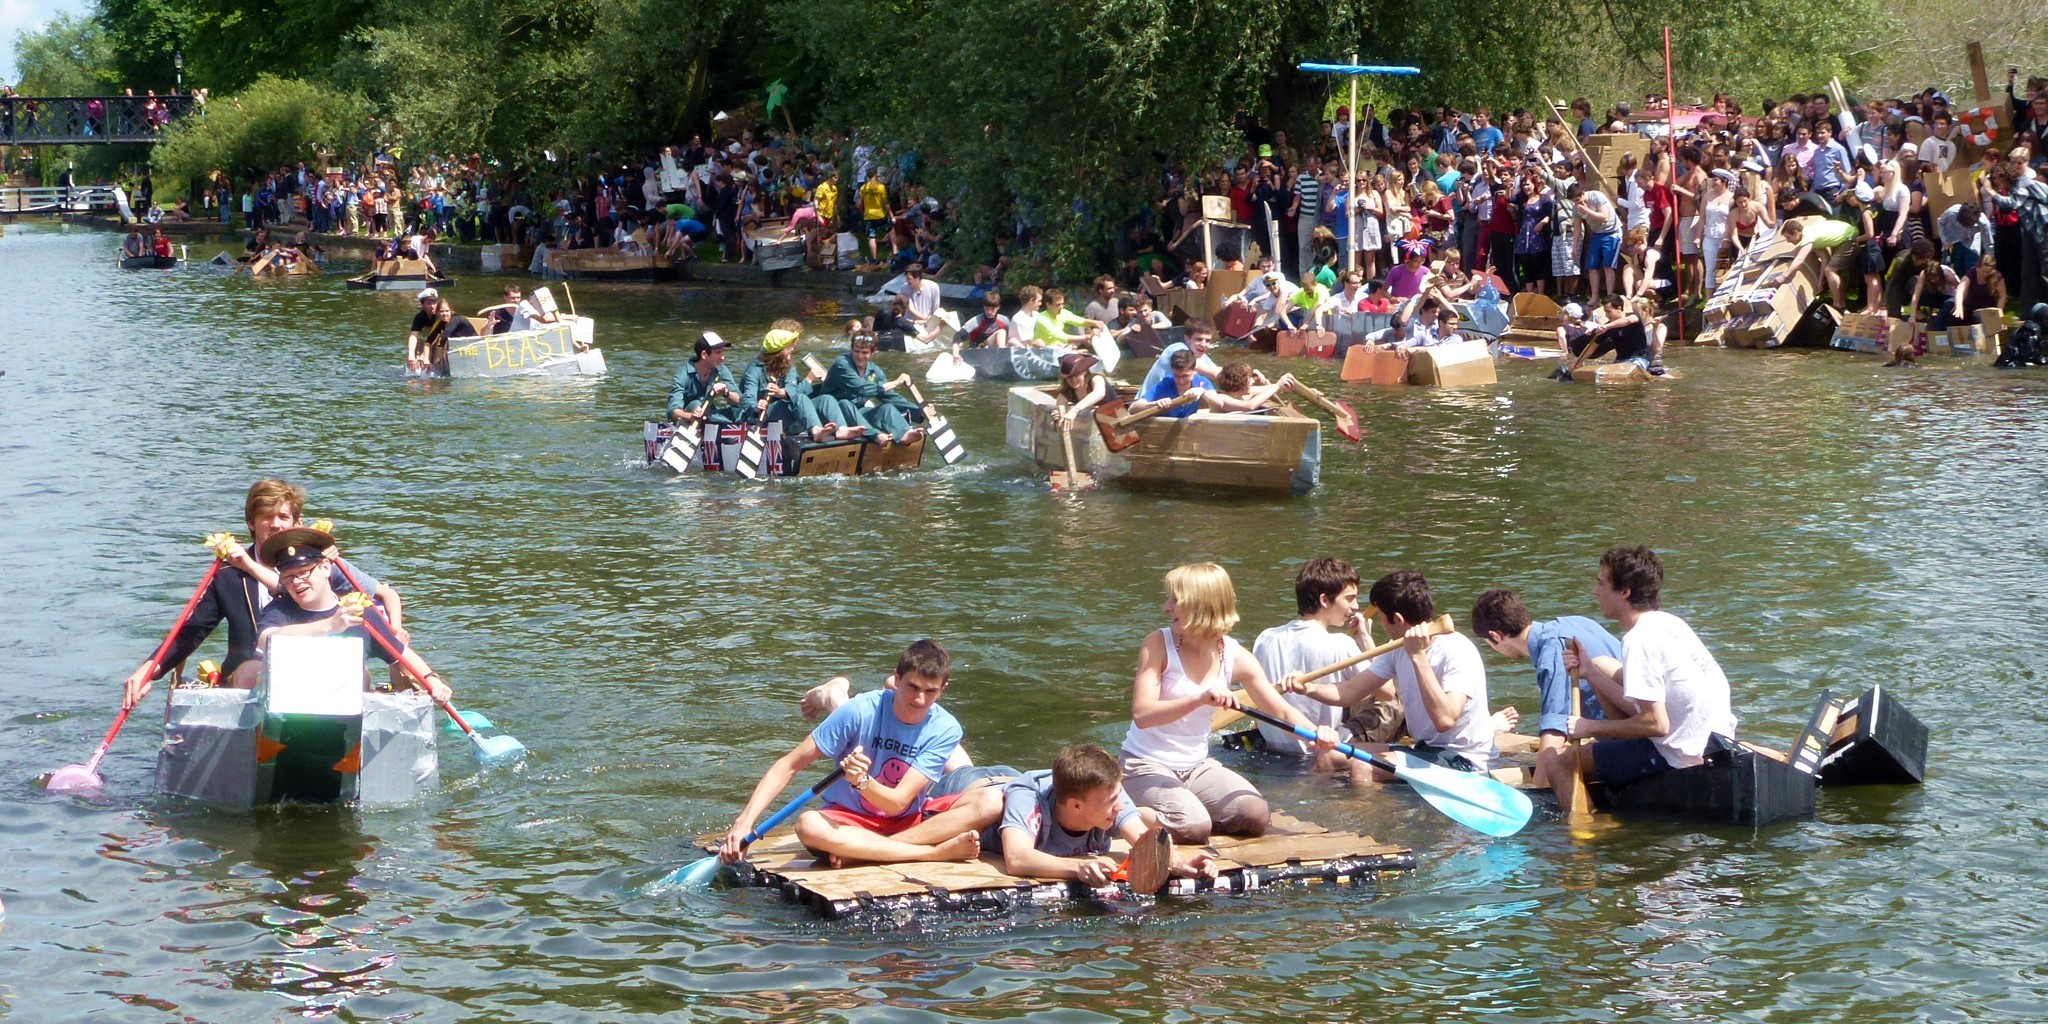 Cambridge cardboard boat race: participants in action